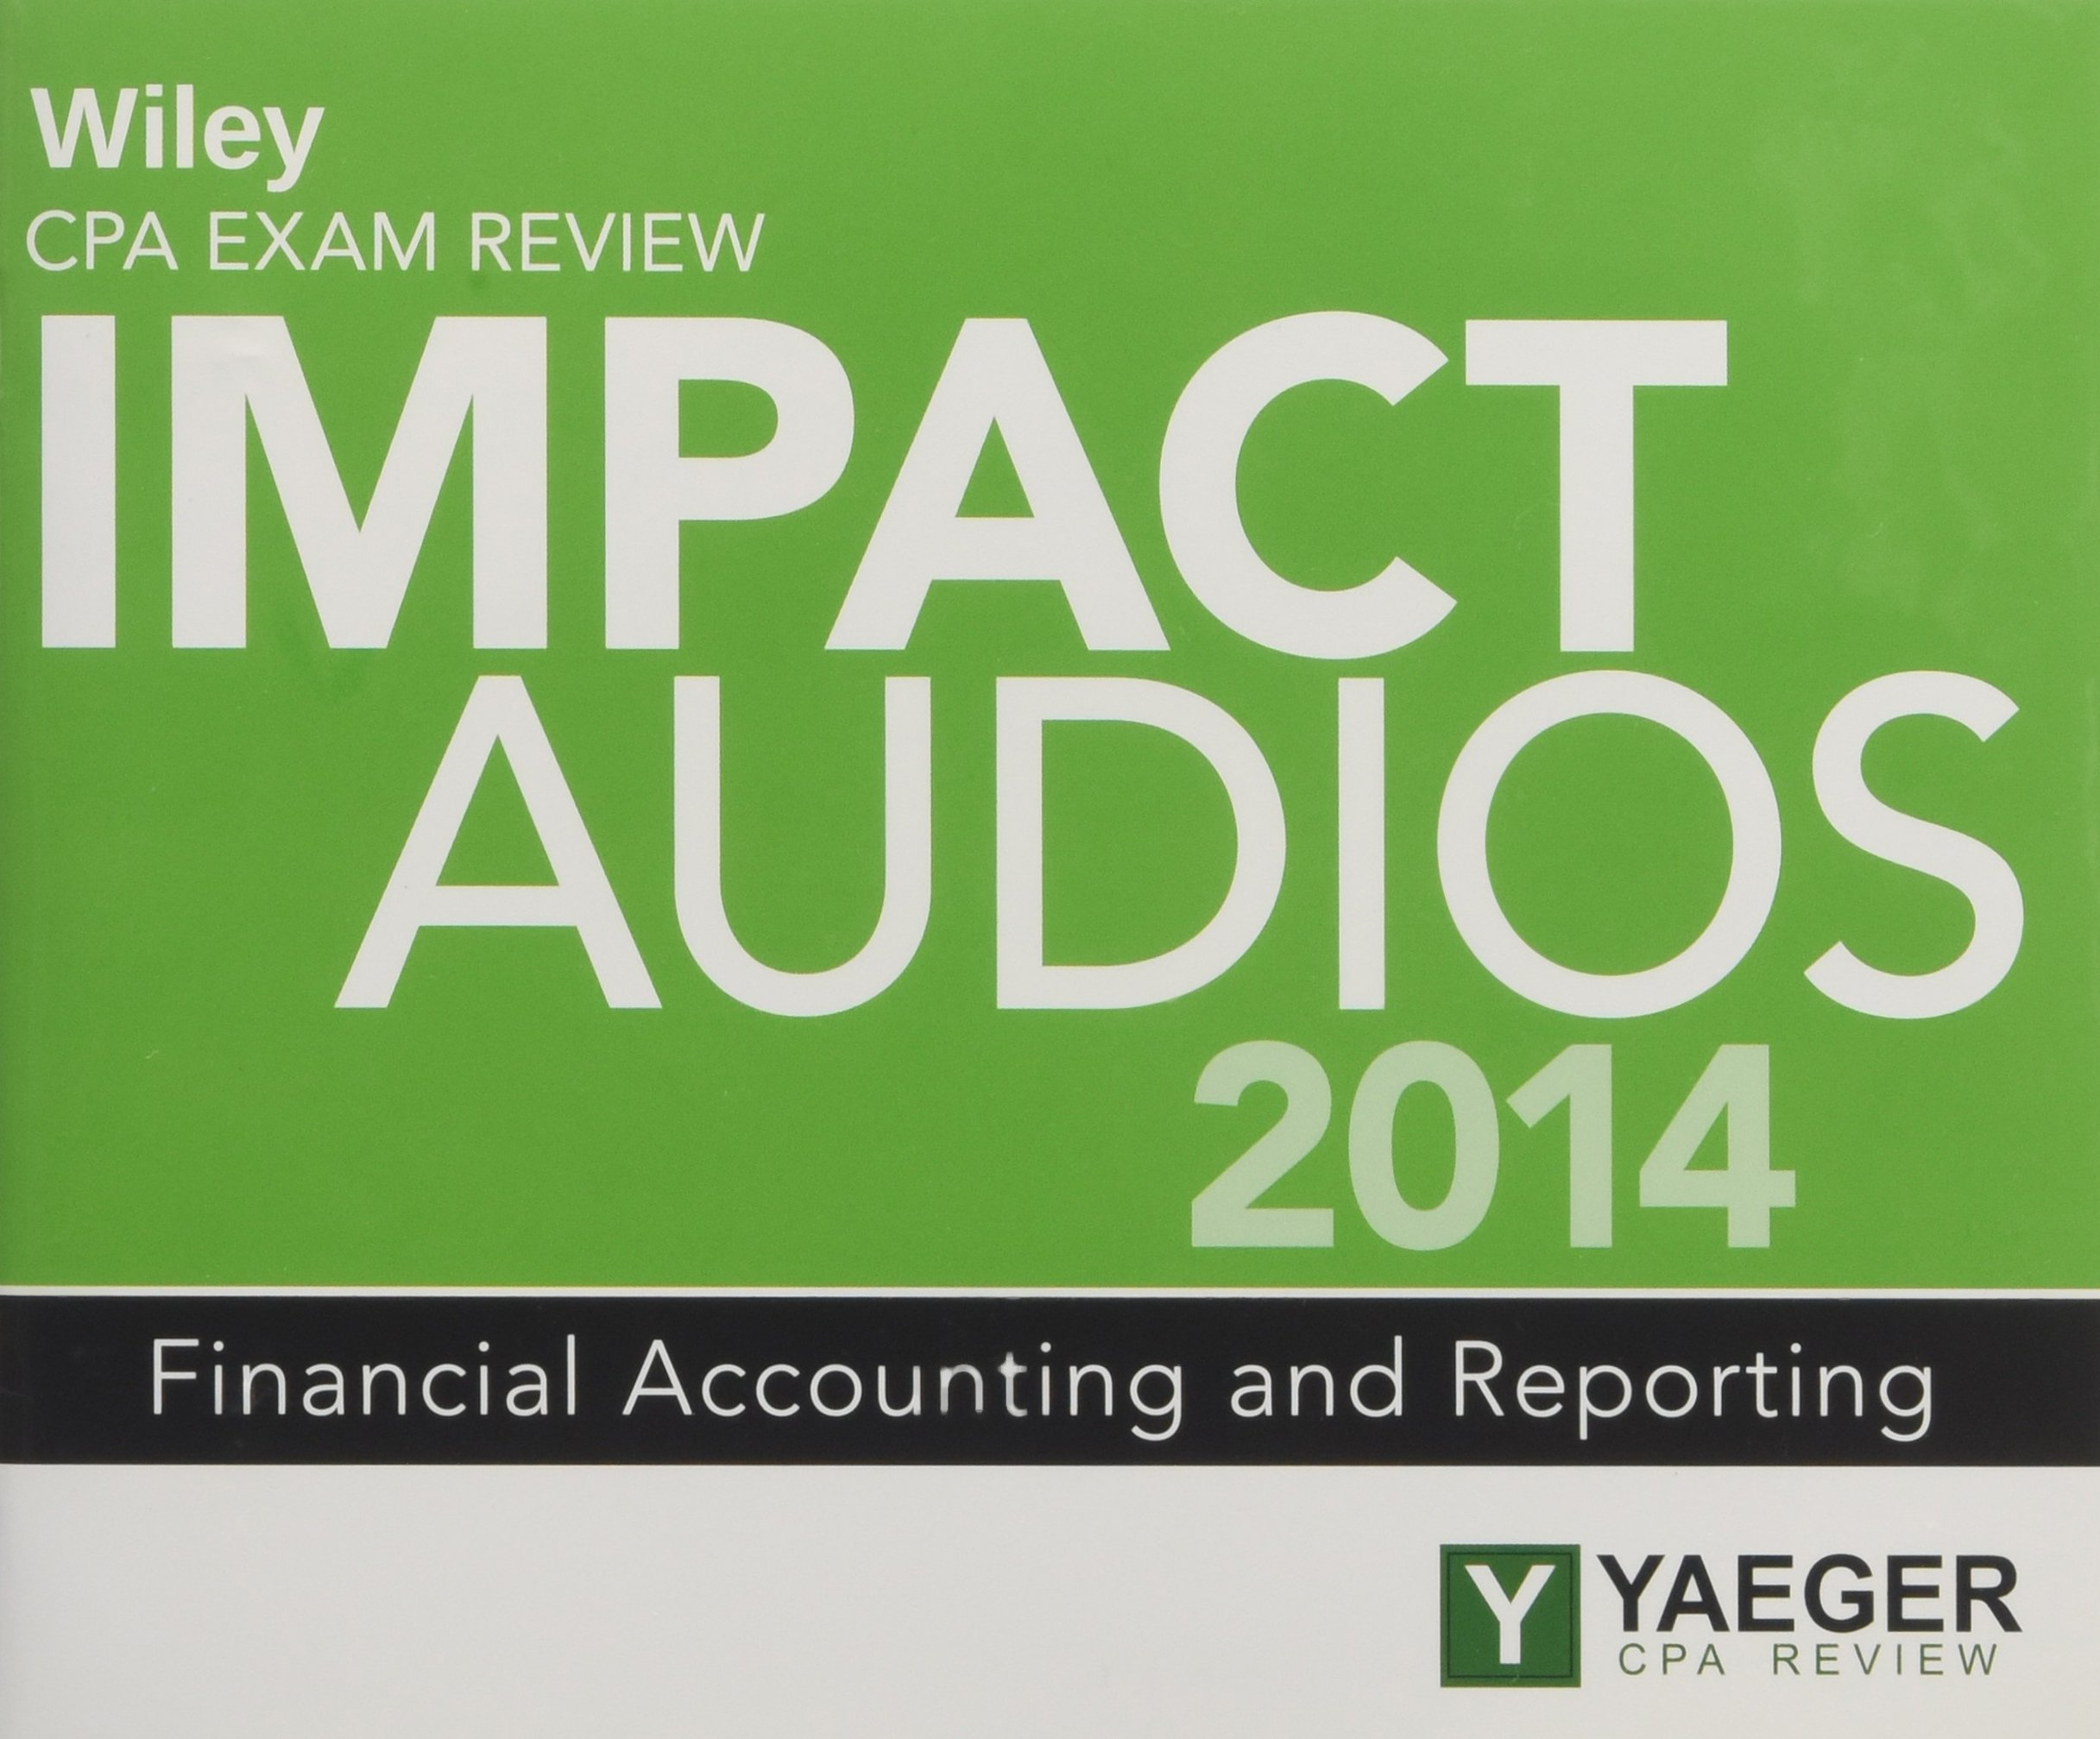 Wiley CPA Exam Review 2014 Impact Audios: Financial Accounting and Reporting (Wiley CPA Exam Review Impact Audios)